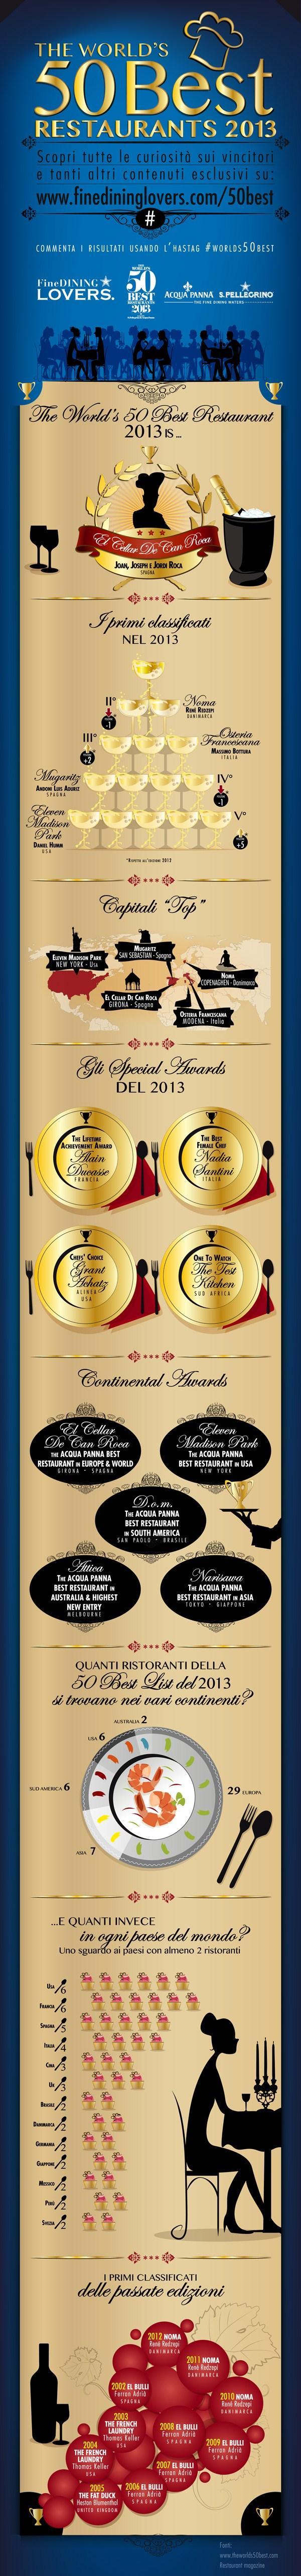 the-world-s-50-best-restaurants-infografica-edizione-2013